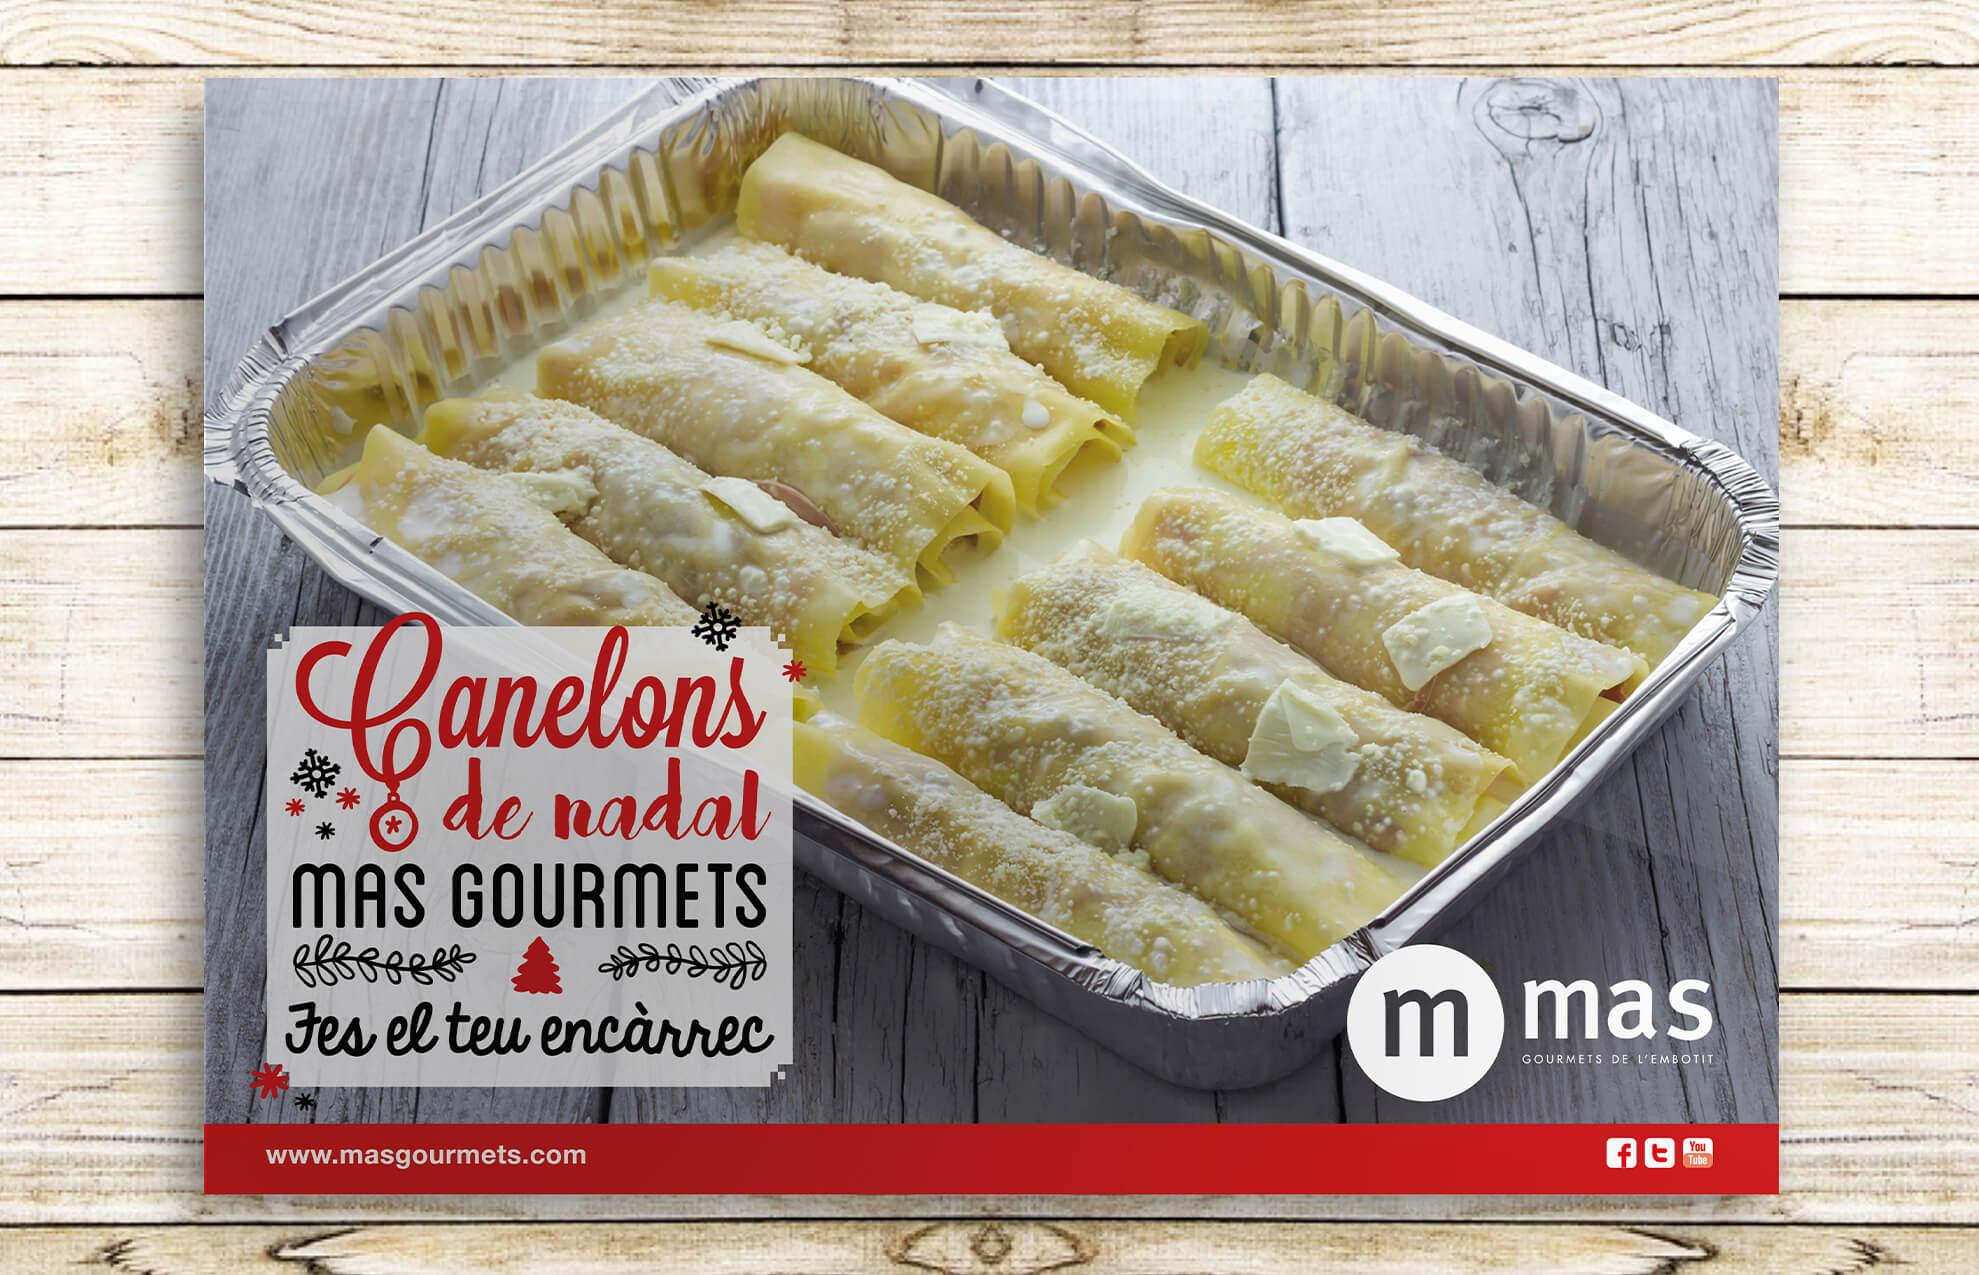 comunicacion-productos-alimentacion-barcelona